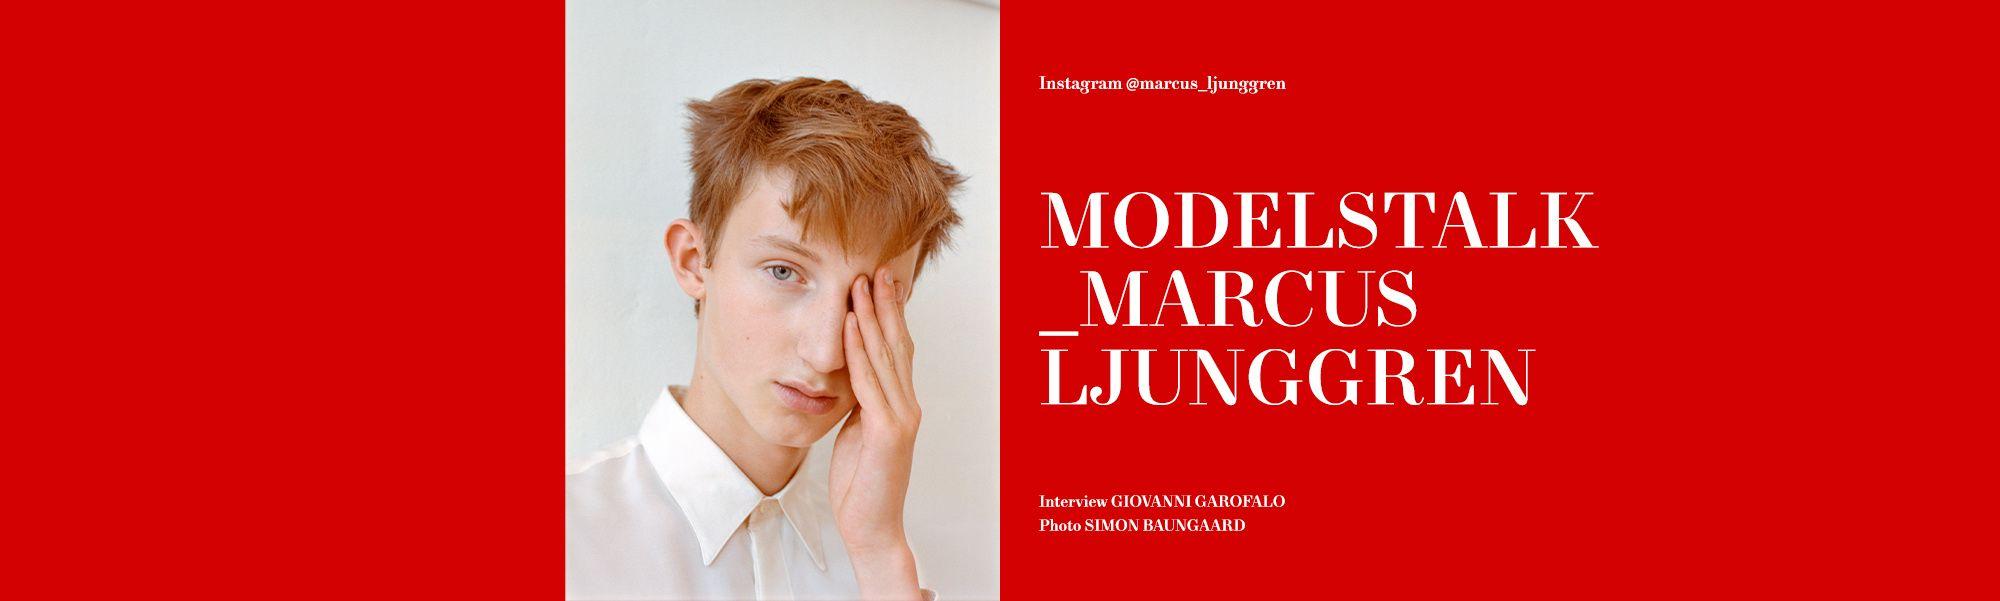 marcus-ljunggren-thegreatestmagazine-main-banner